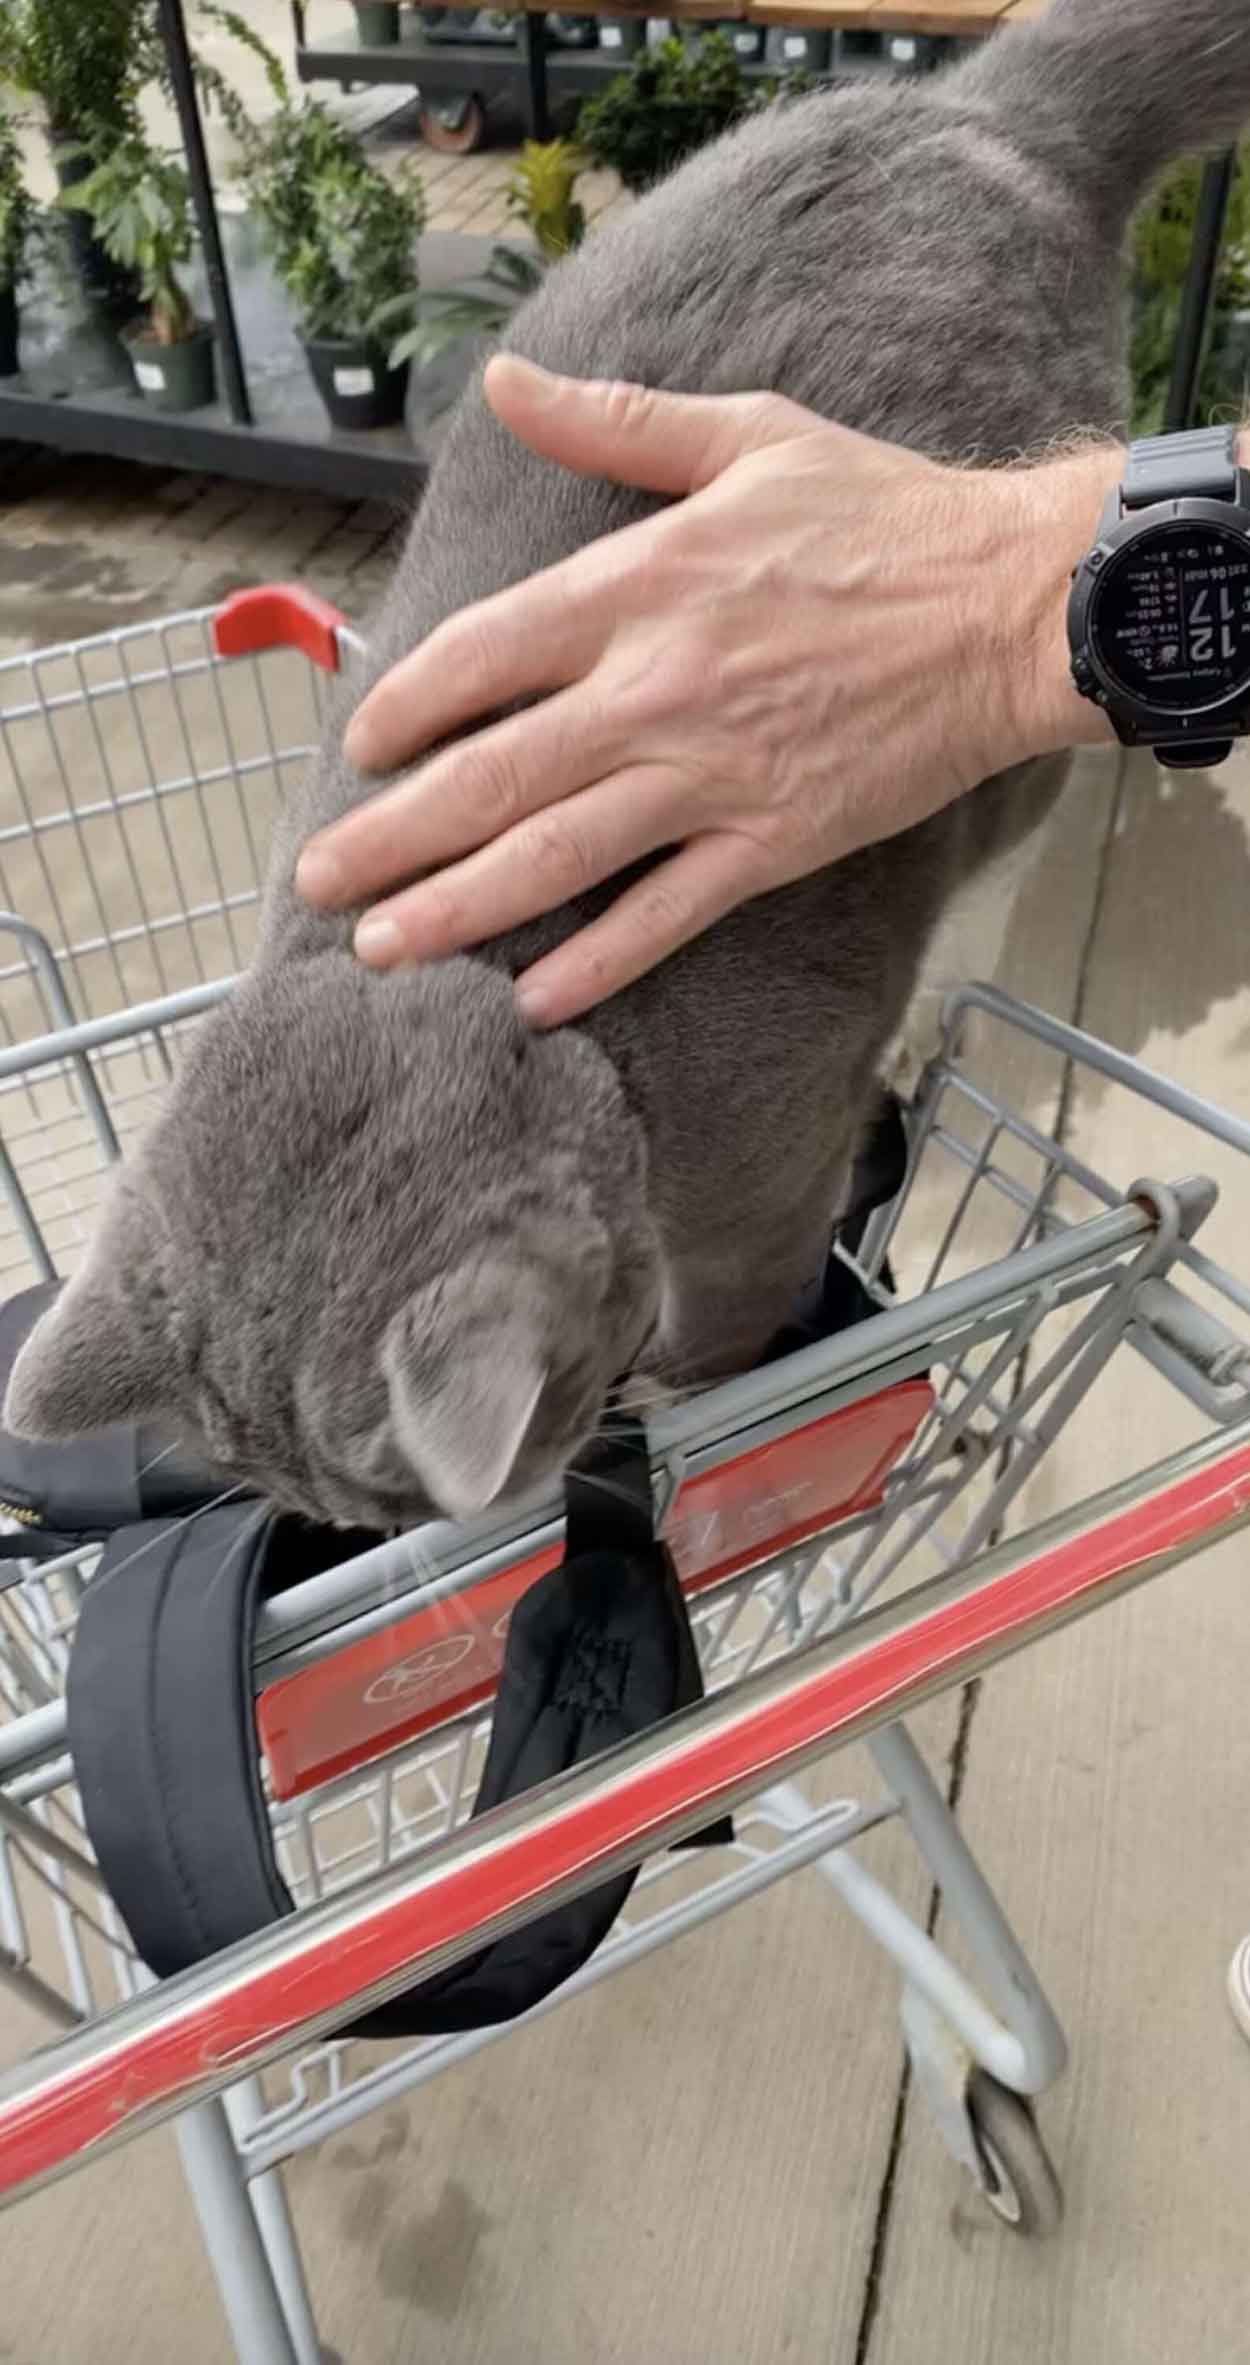 Gatito de una tienda muy consentido